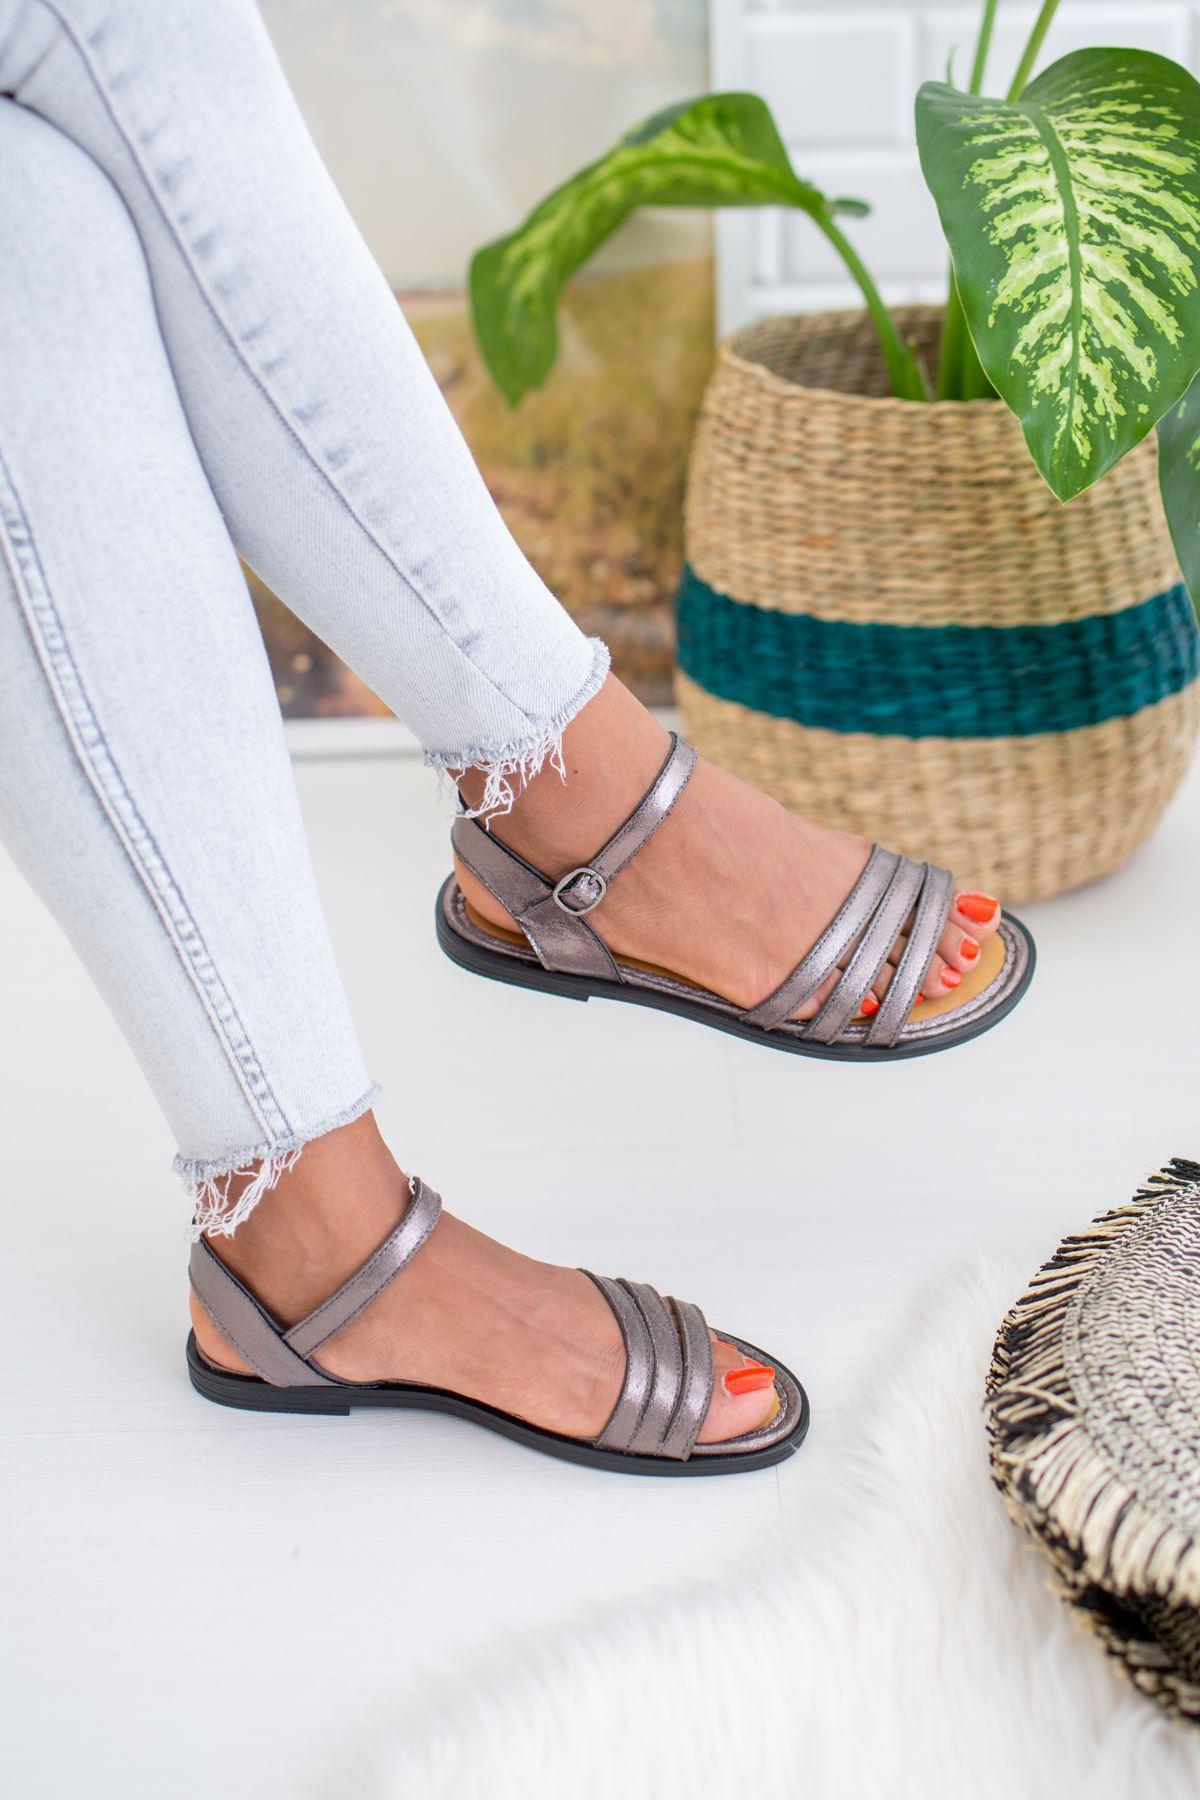 3 Bantlı Platin Sandalet